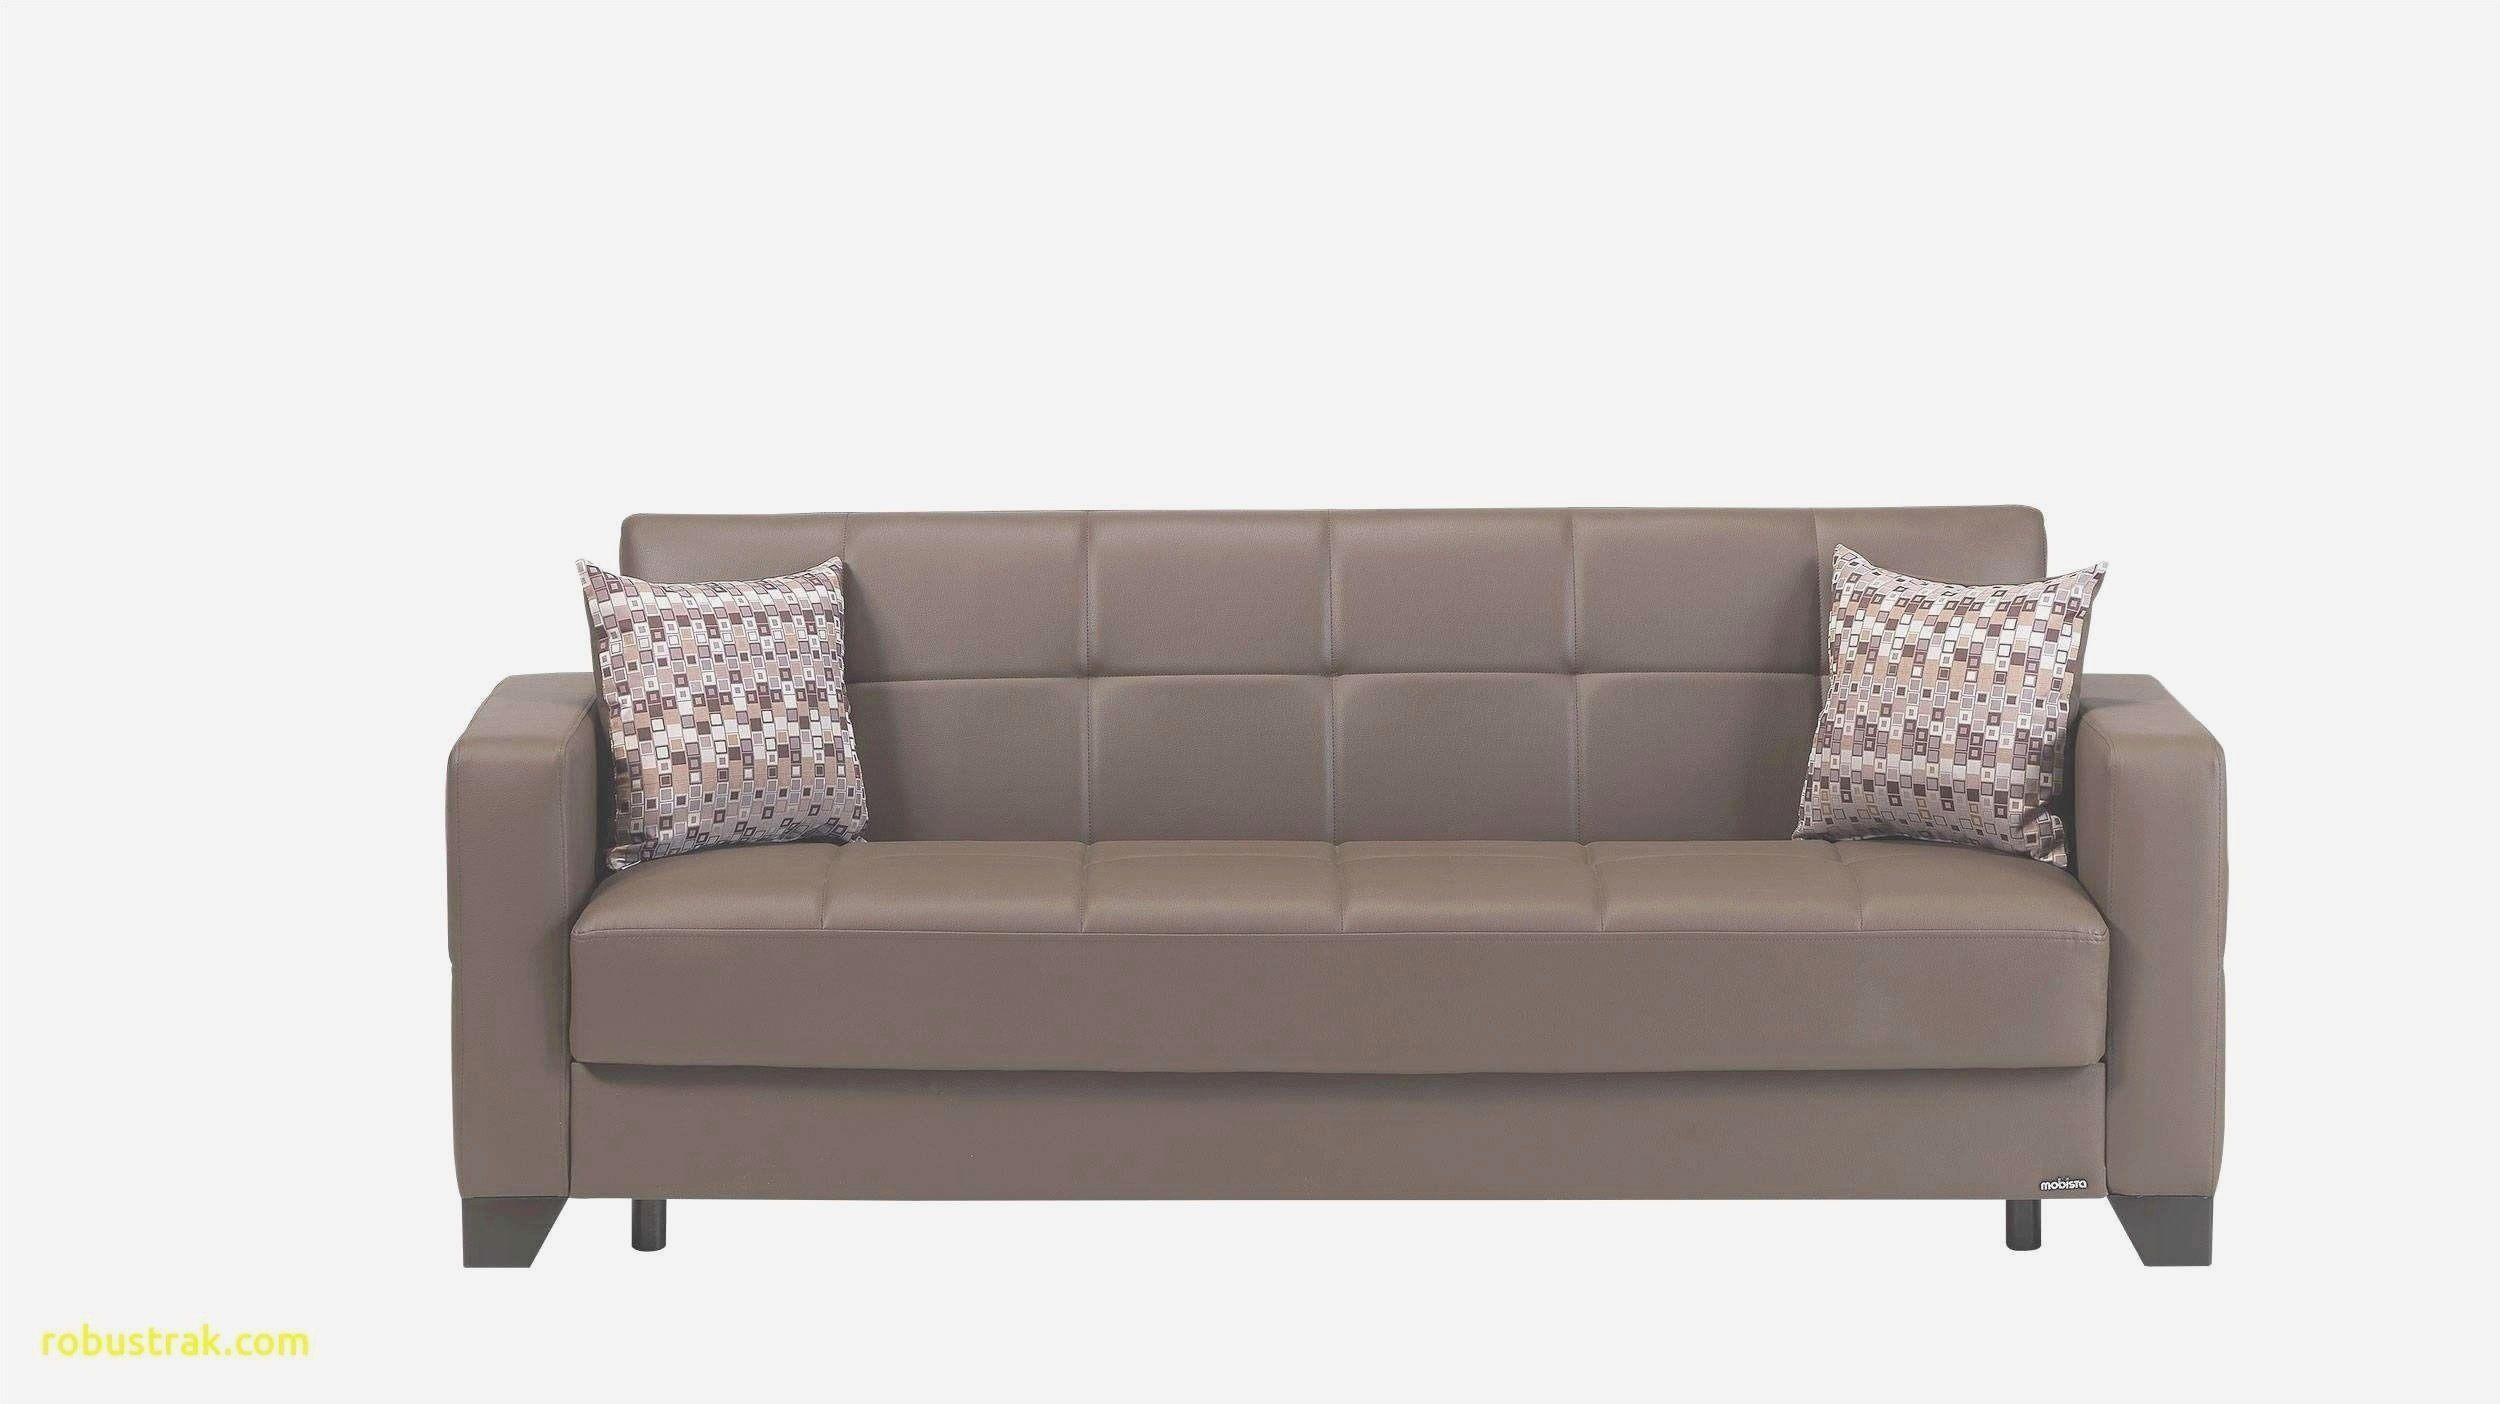 Lit King Size Ikea De Luxe Futon sofa Bed